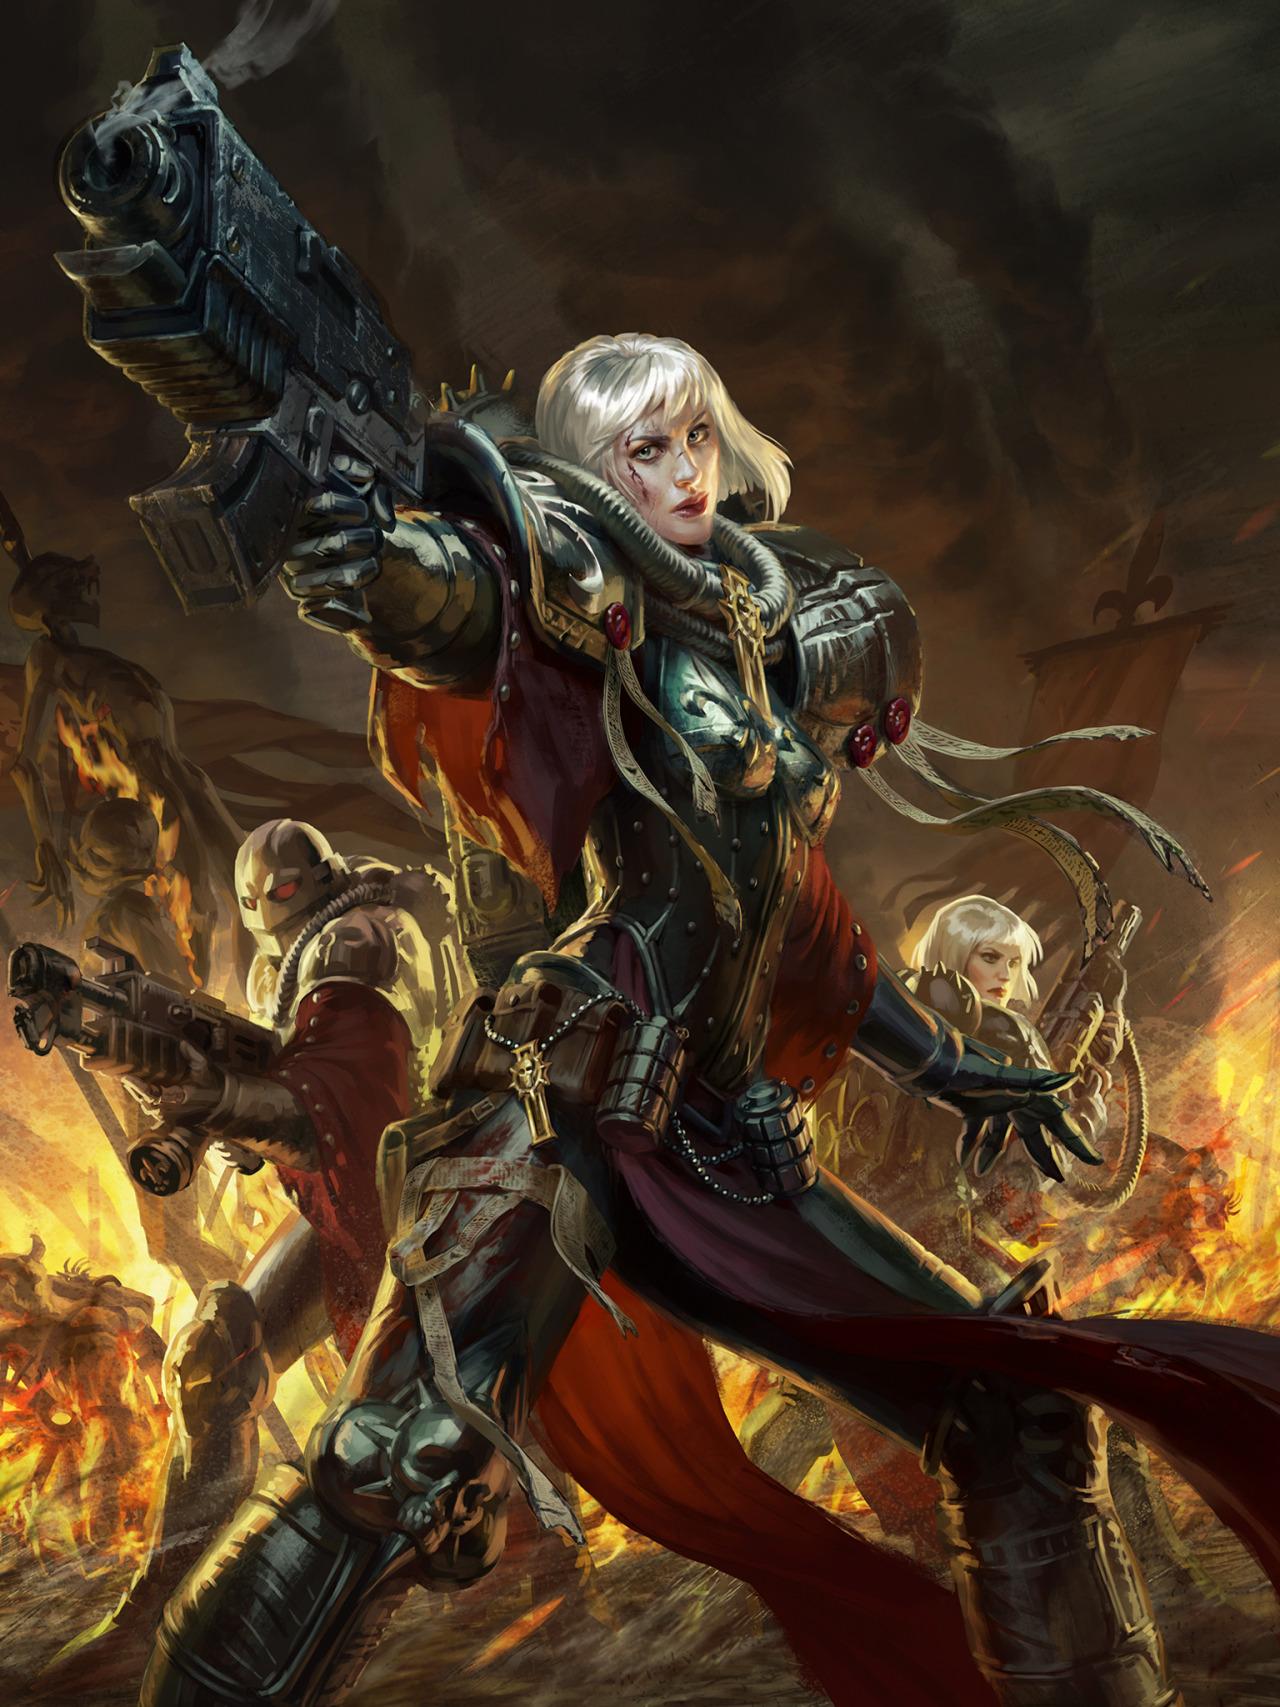 Warhammer 40k Sisters Of Battle 1280x1707 Wallpaper Teahub Io